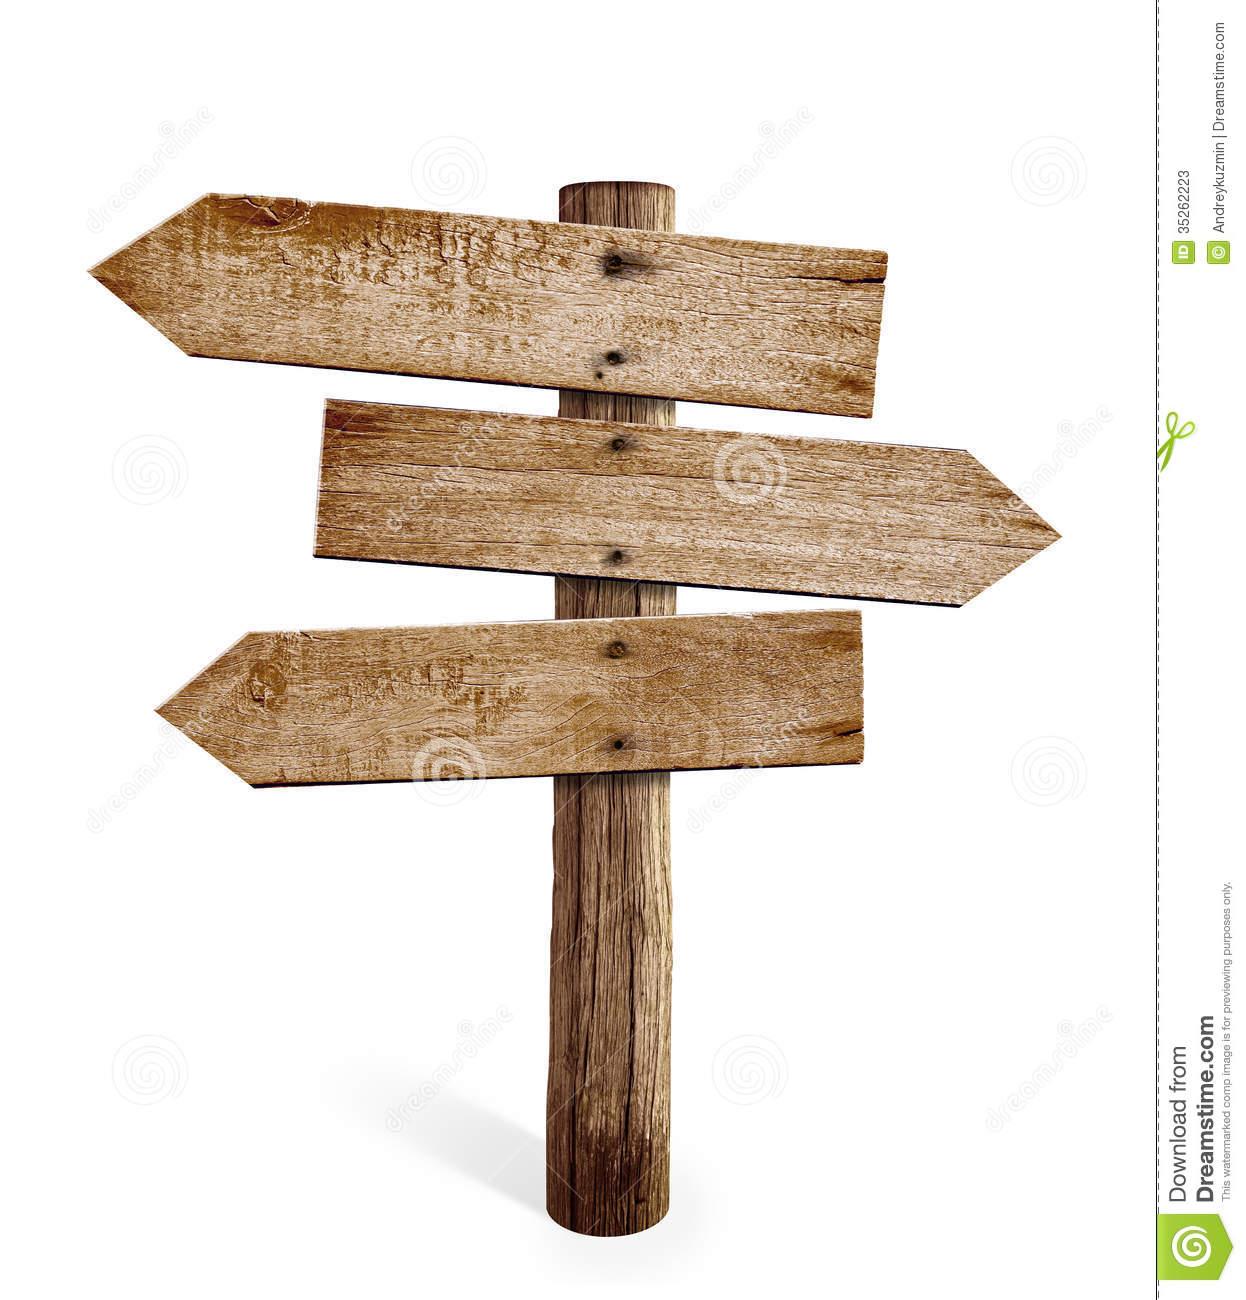 Hölzerner Pfeilwegweiser oder Straßenwegweiser lokalisiert Stockfotos - Wegweiser Holz PNG